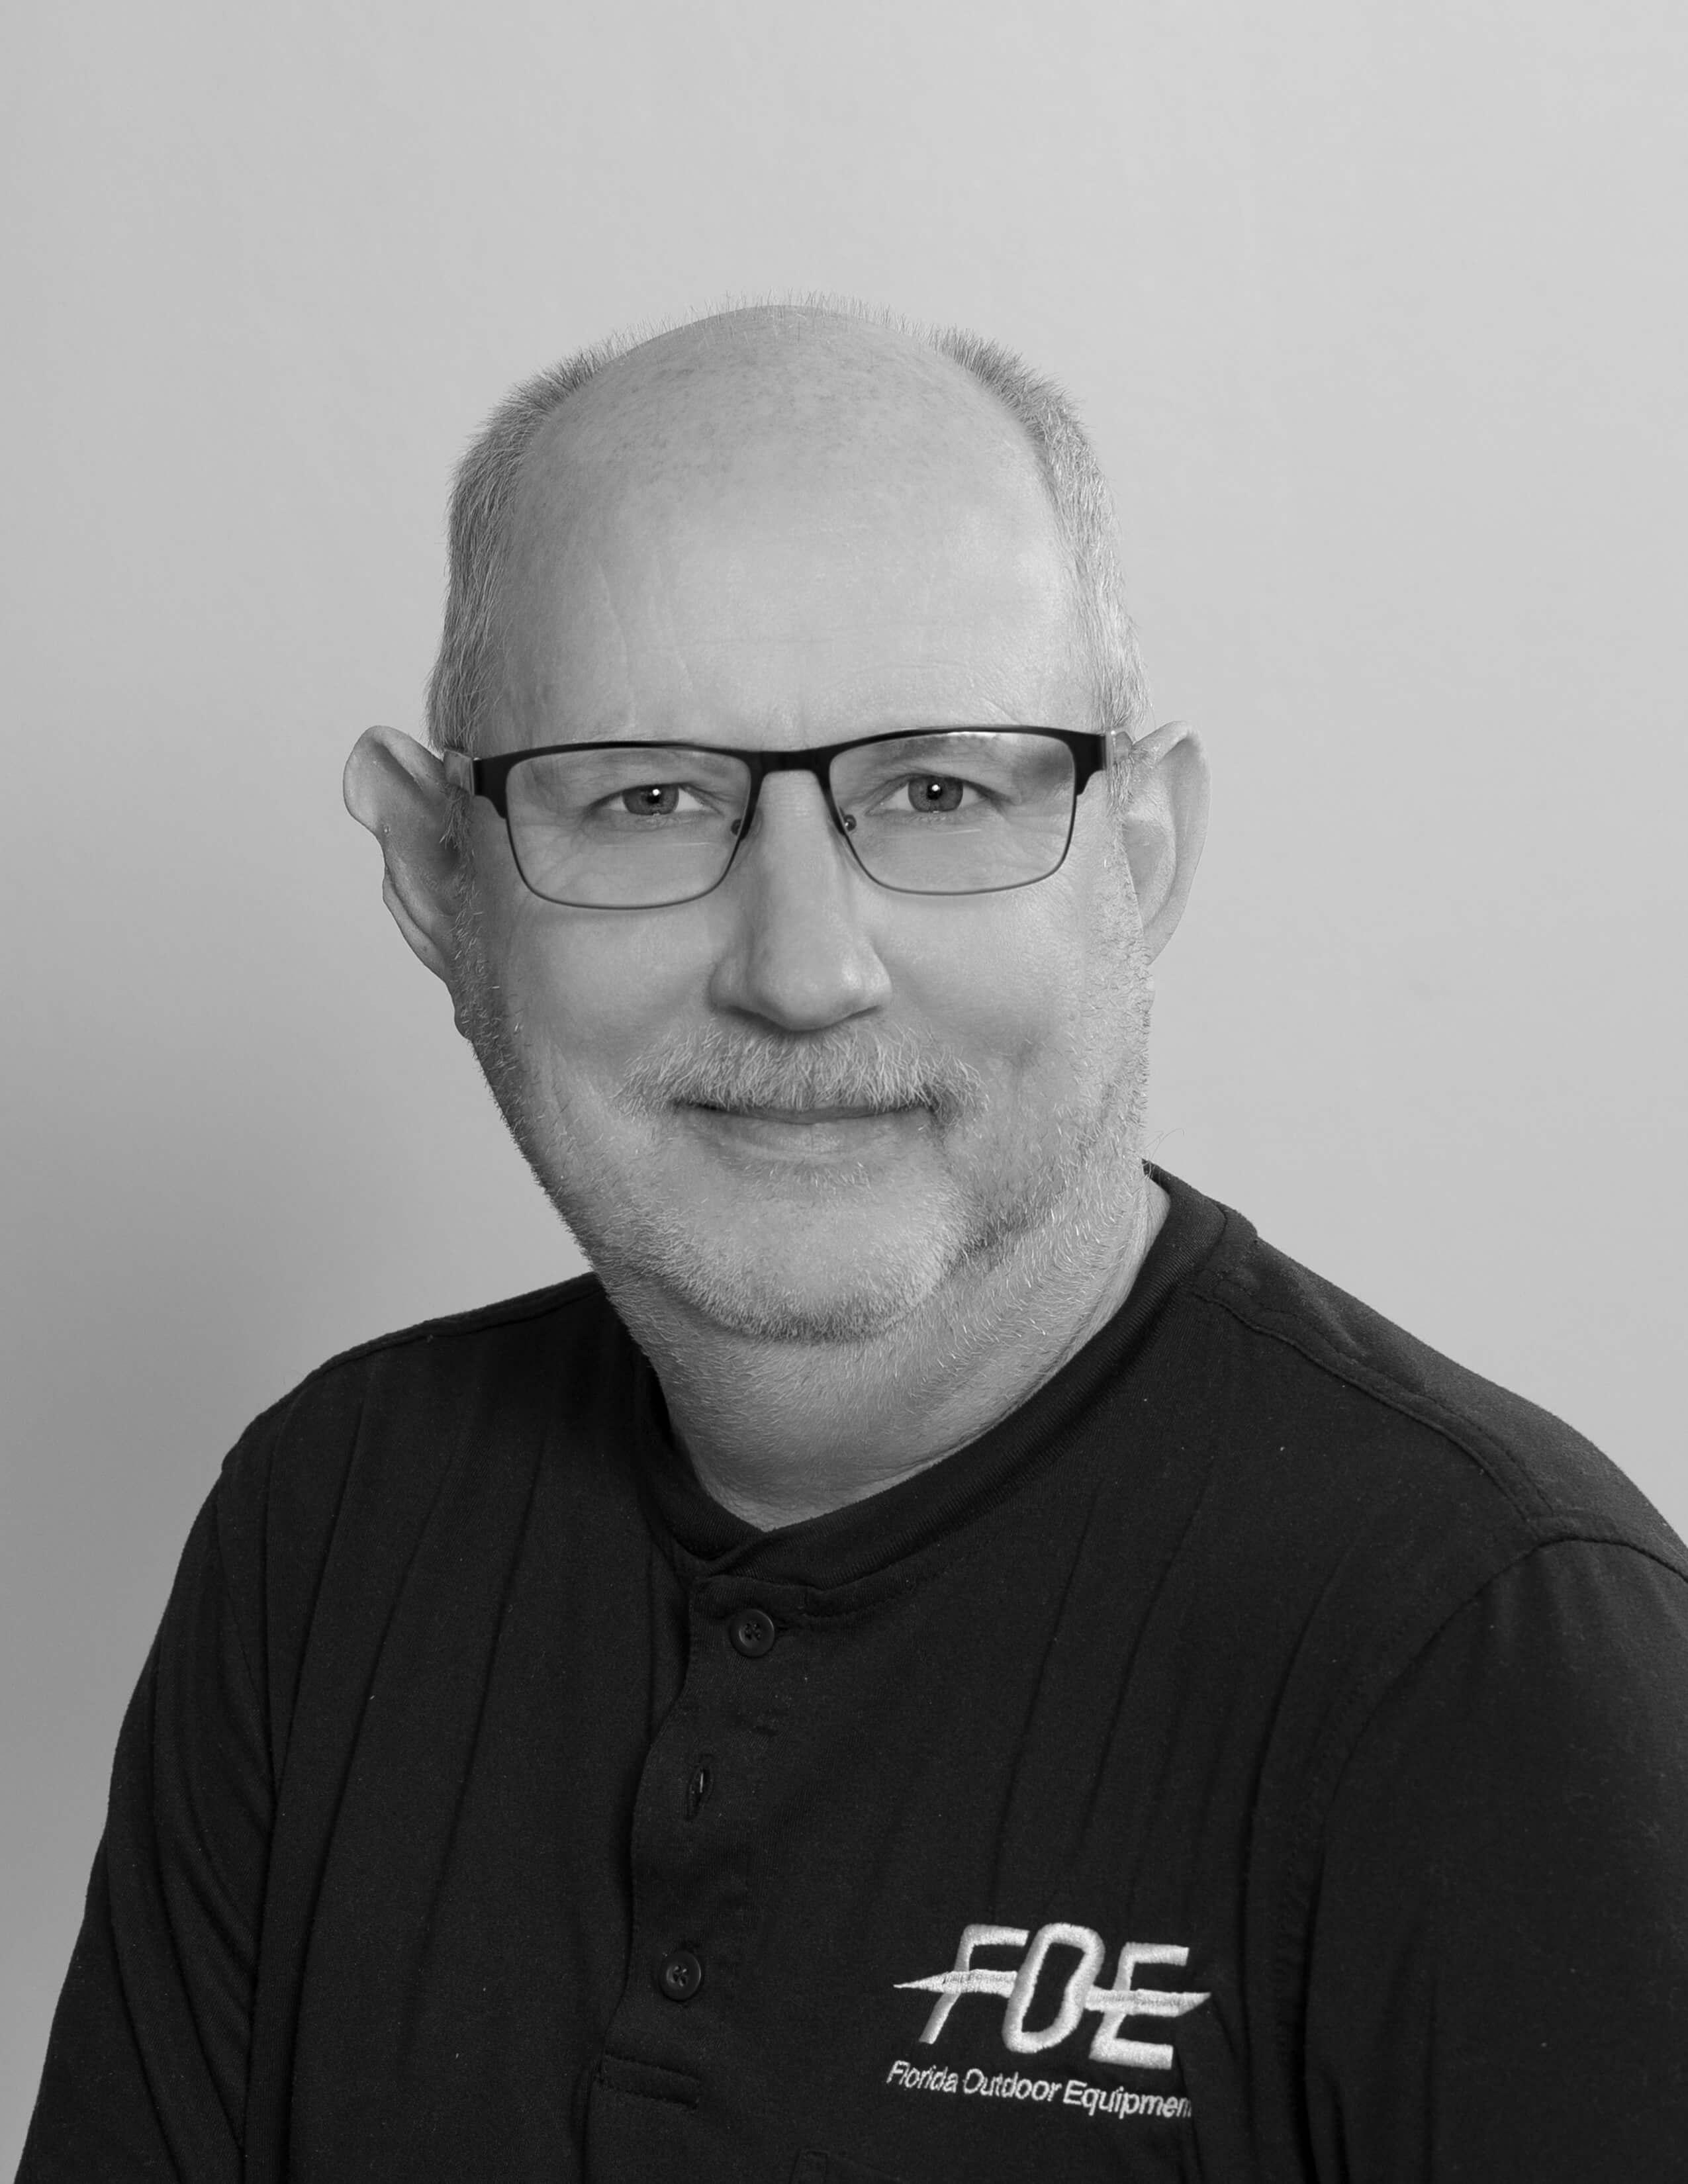 Joe Kennedy profile image